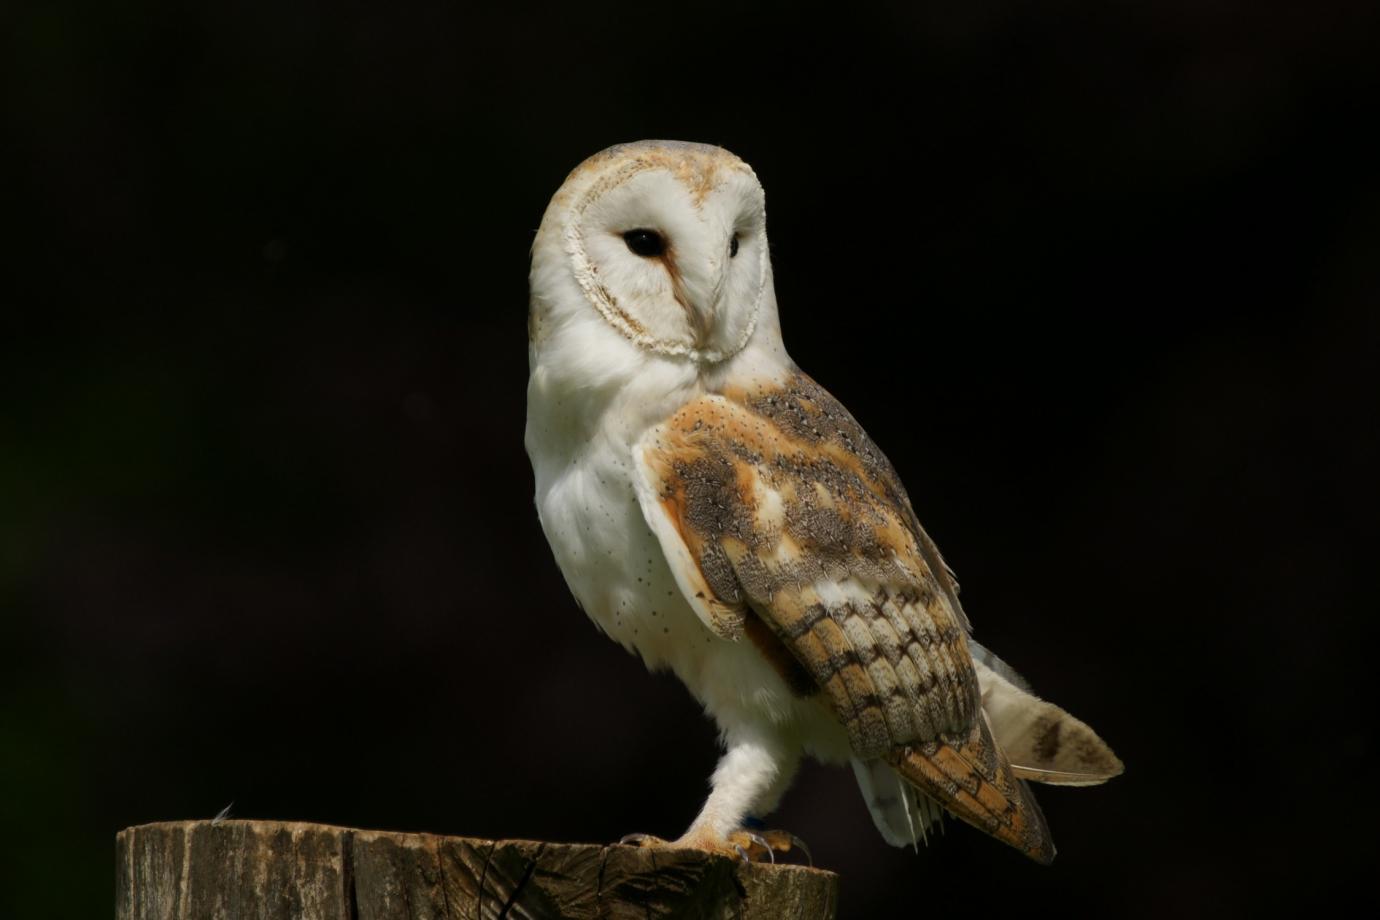 Barn Owl - Facts, Pictures, Diet, Breeding, Habitat ...